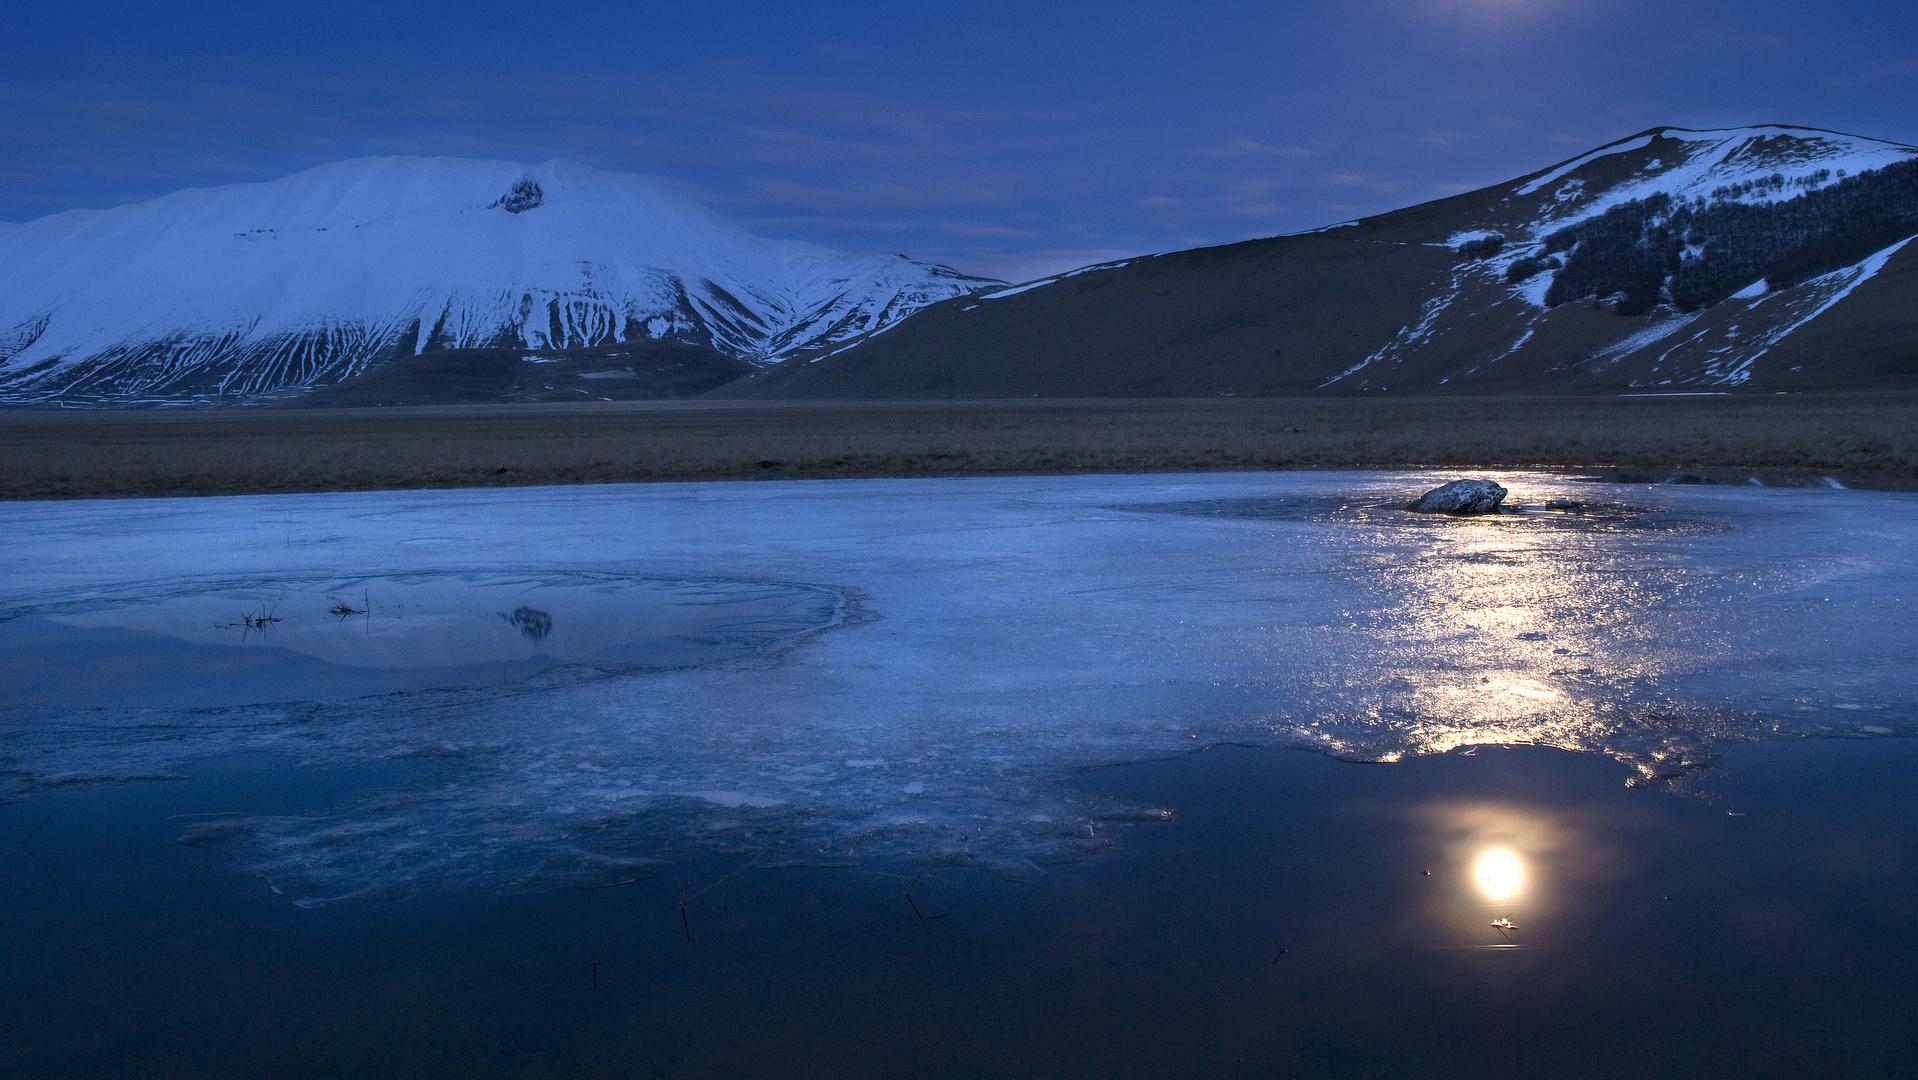 Moon on Ice-landscape in castelluccio#2